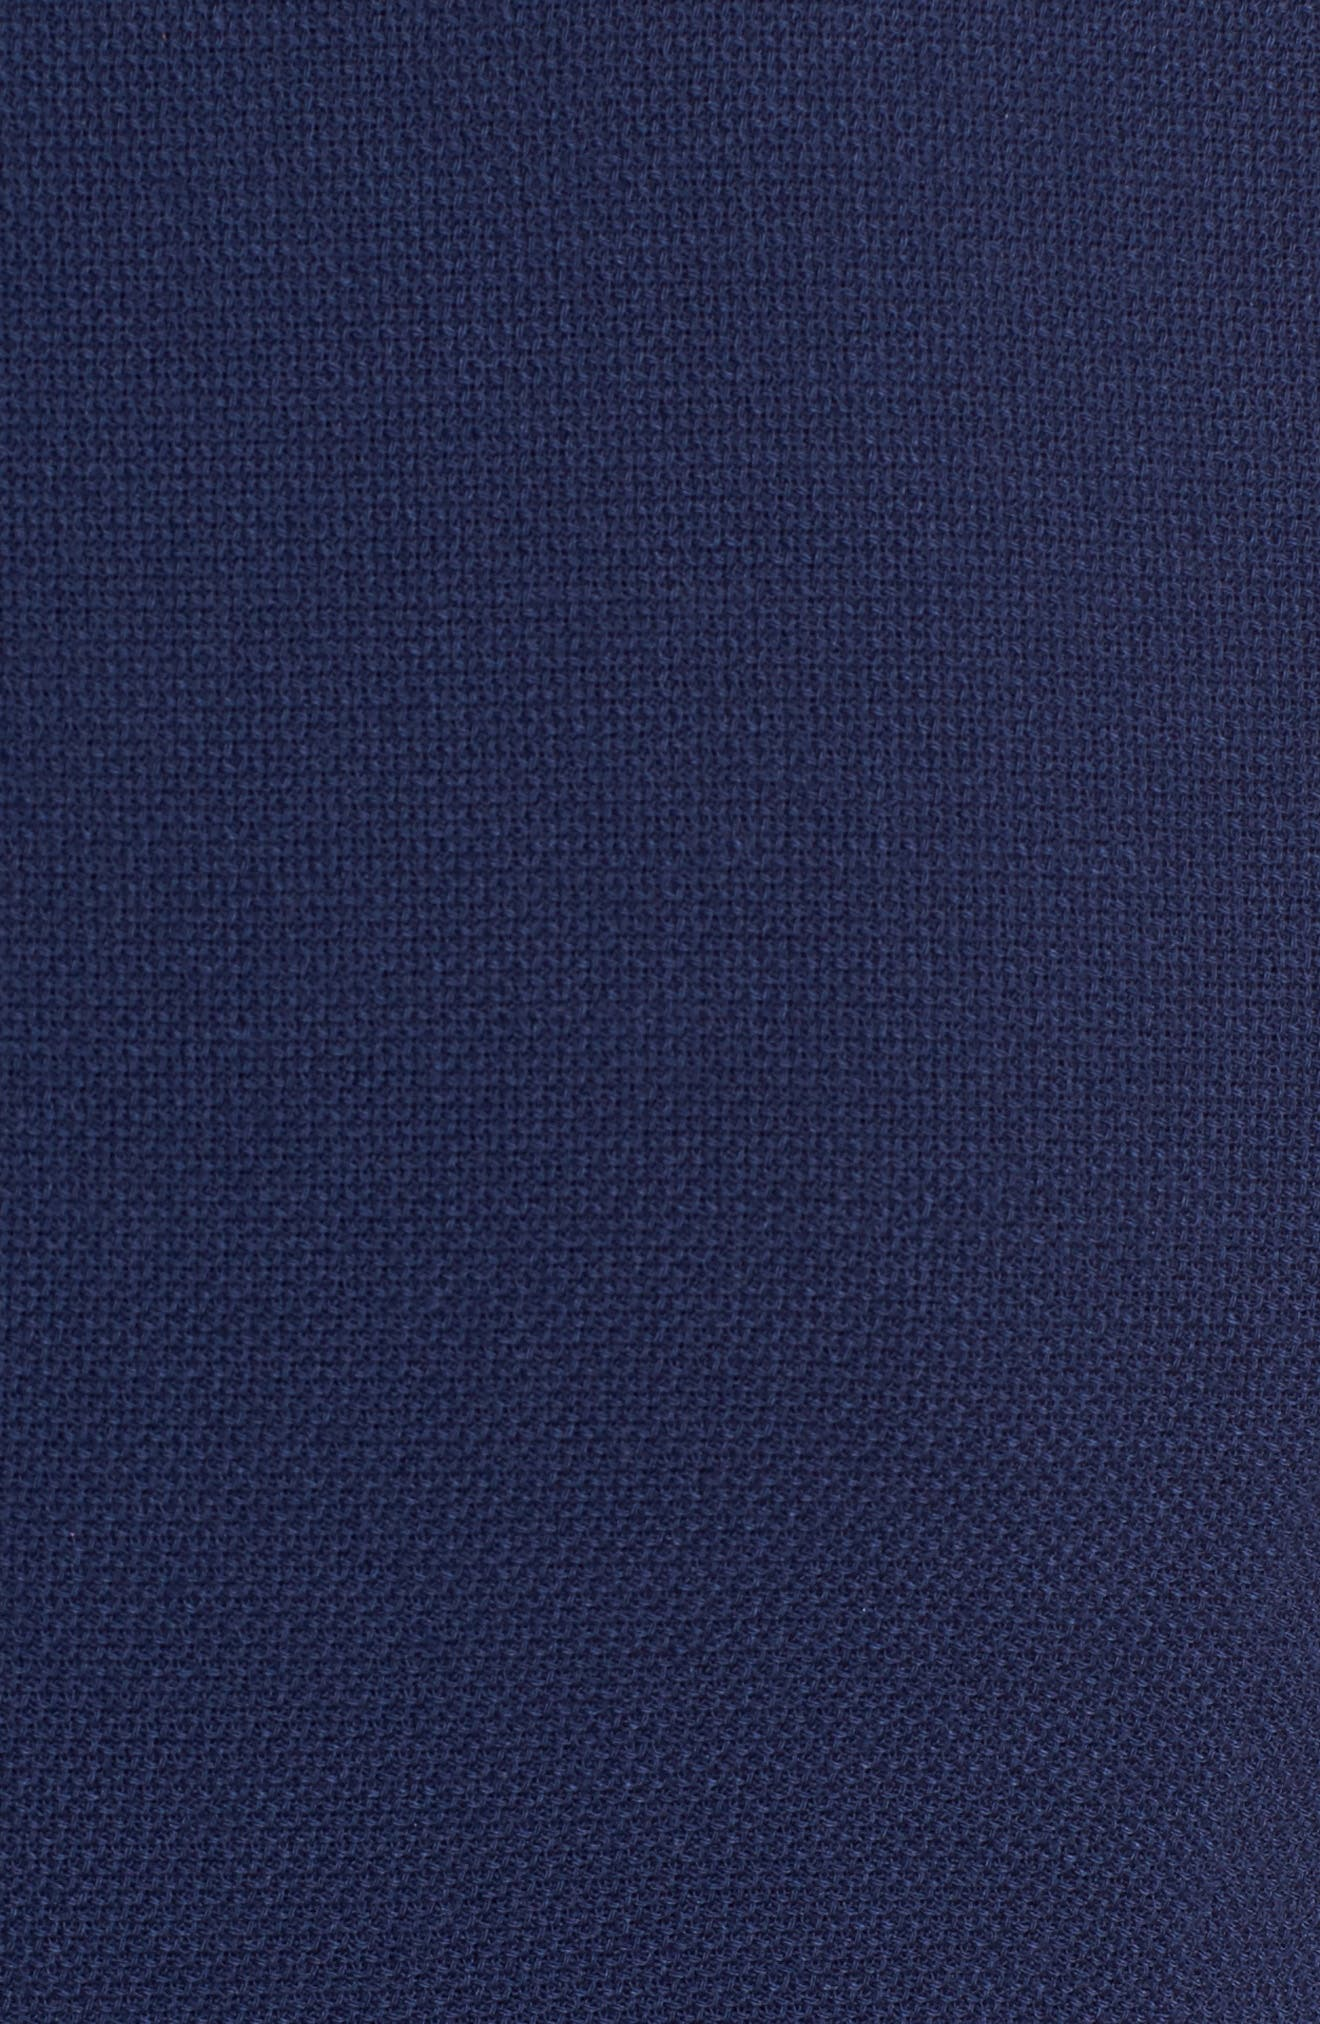 Dibalena Texture Stretch Dress,                             Alternate thumbnail 5, color,                             425